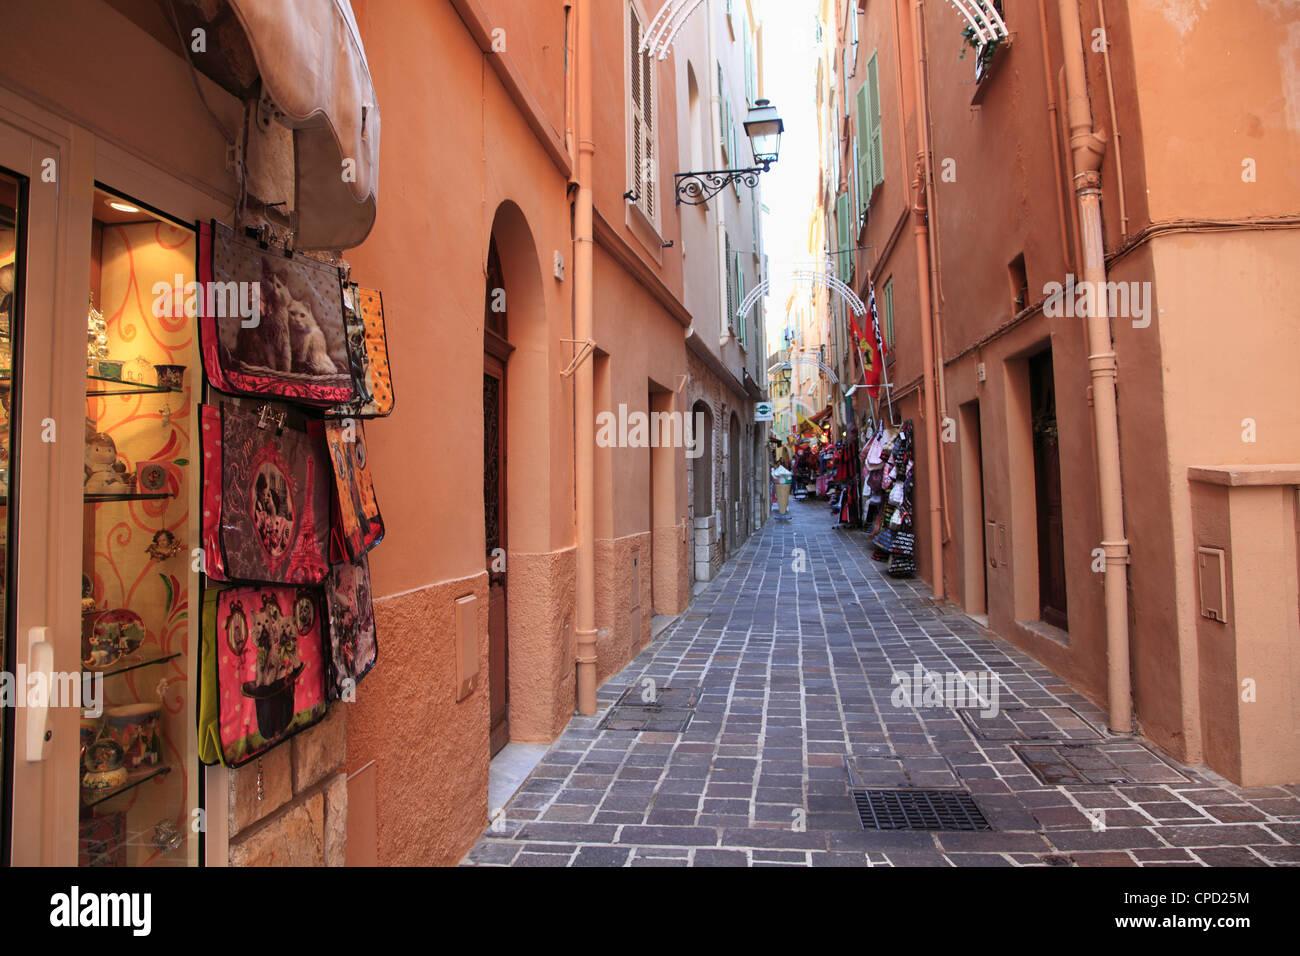 Street scene, Le Rocher (The Rock), Monaco, Cote d'Azur, Mediterranean, Europe - Stock Image